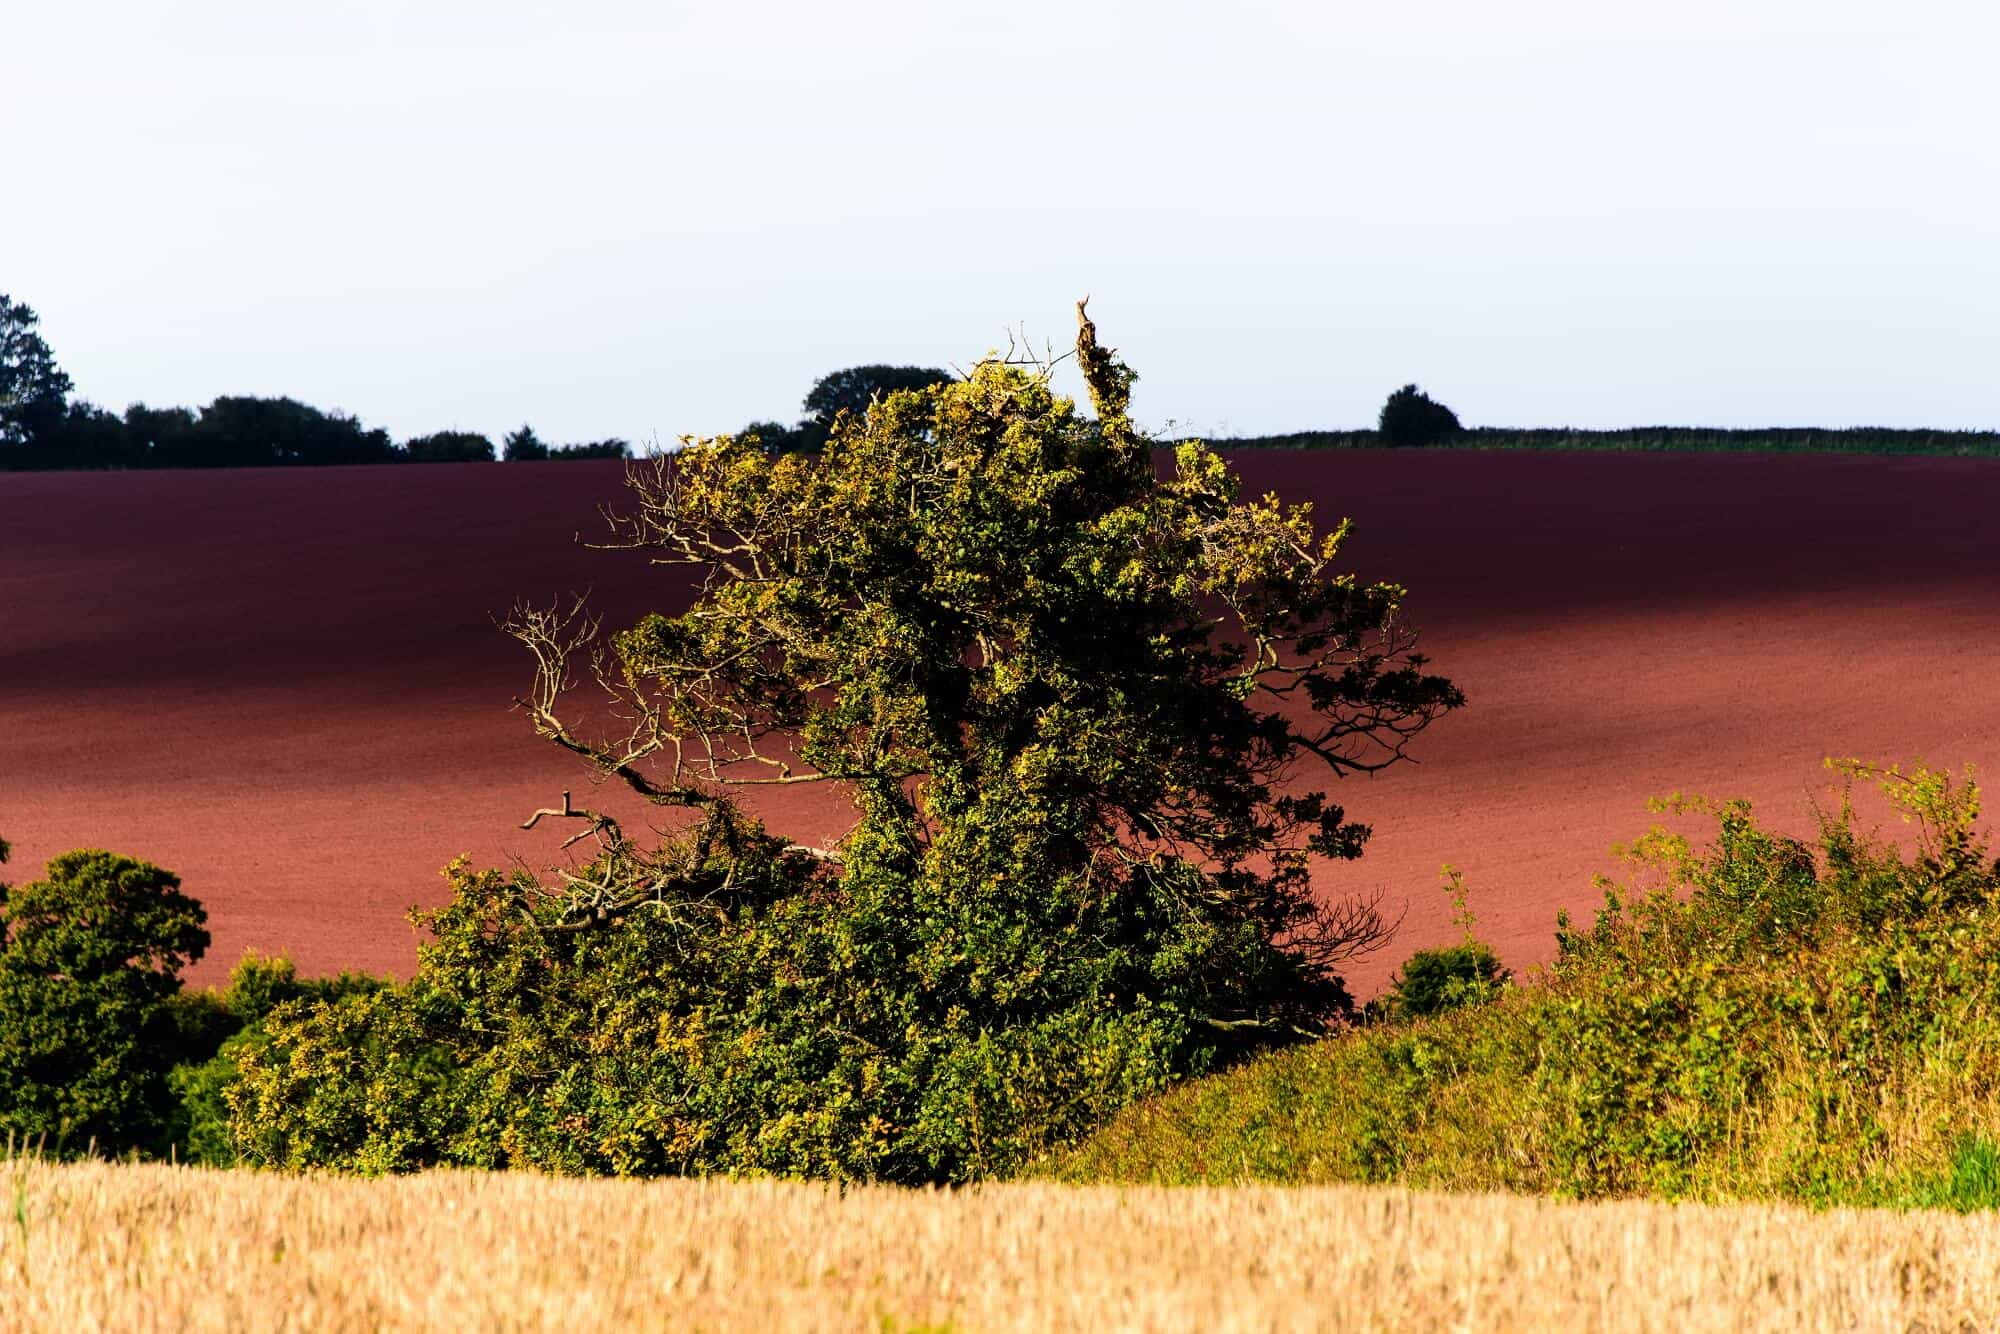 Watchet fields, walking holidays for singles England